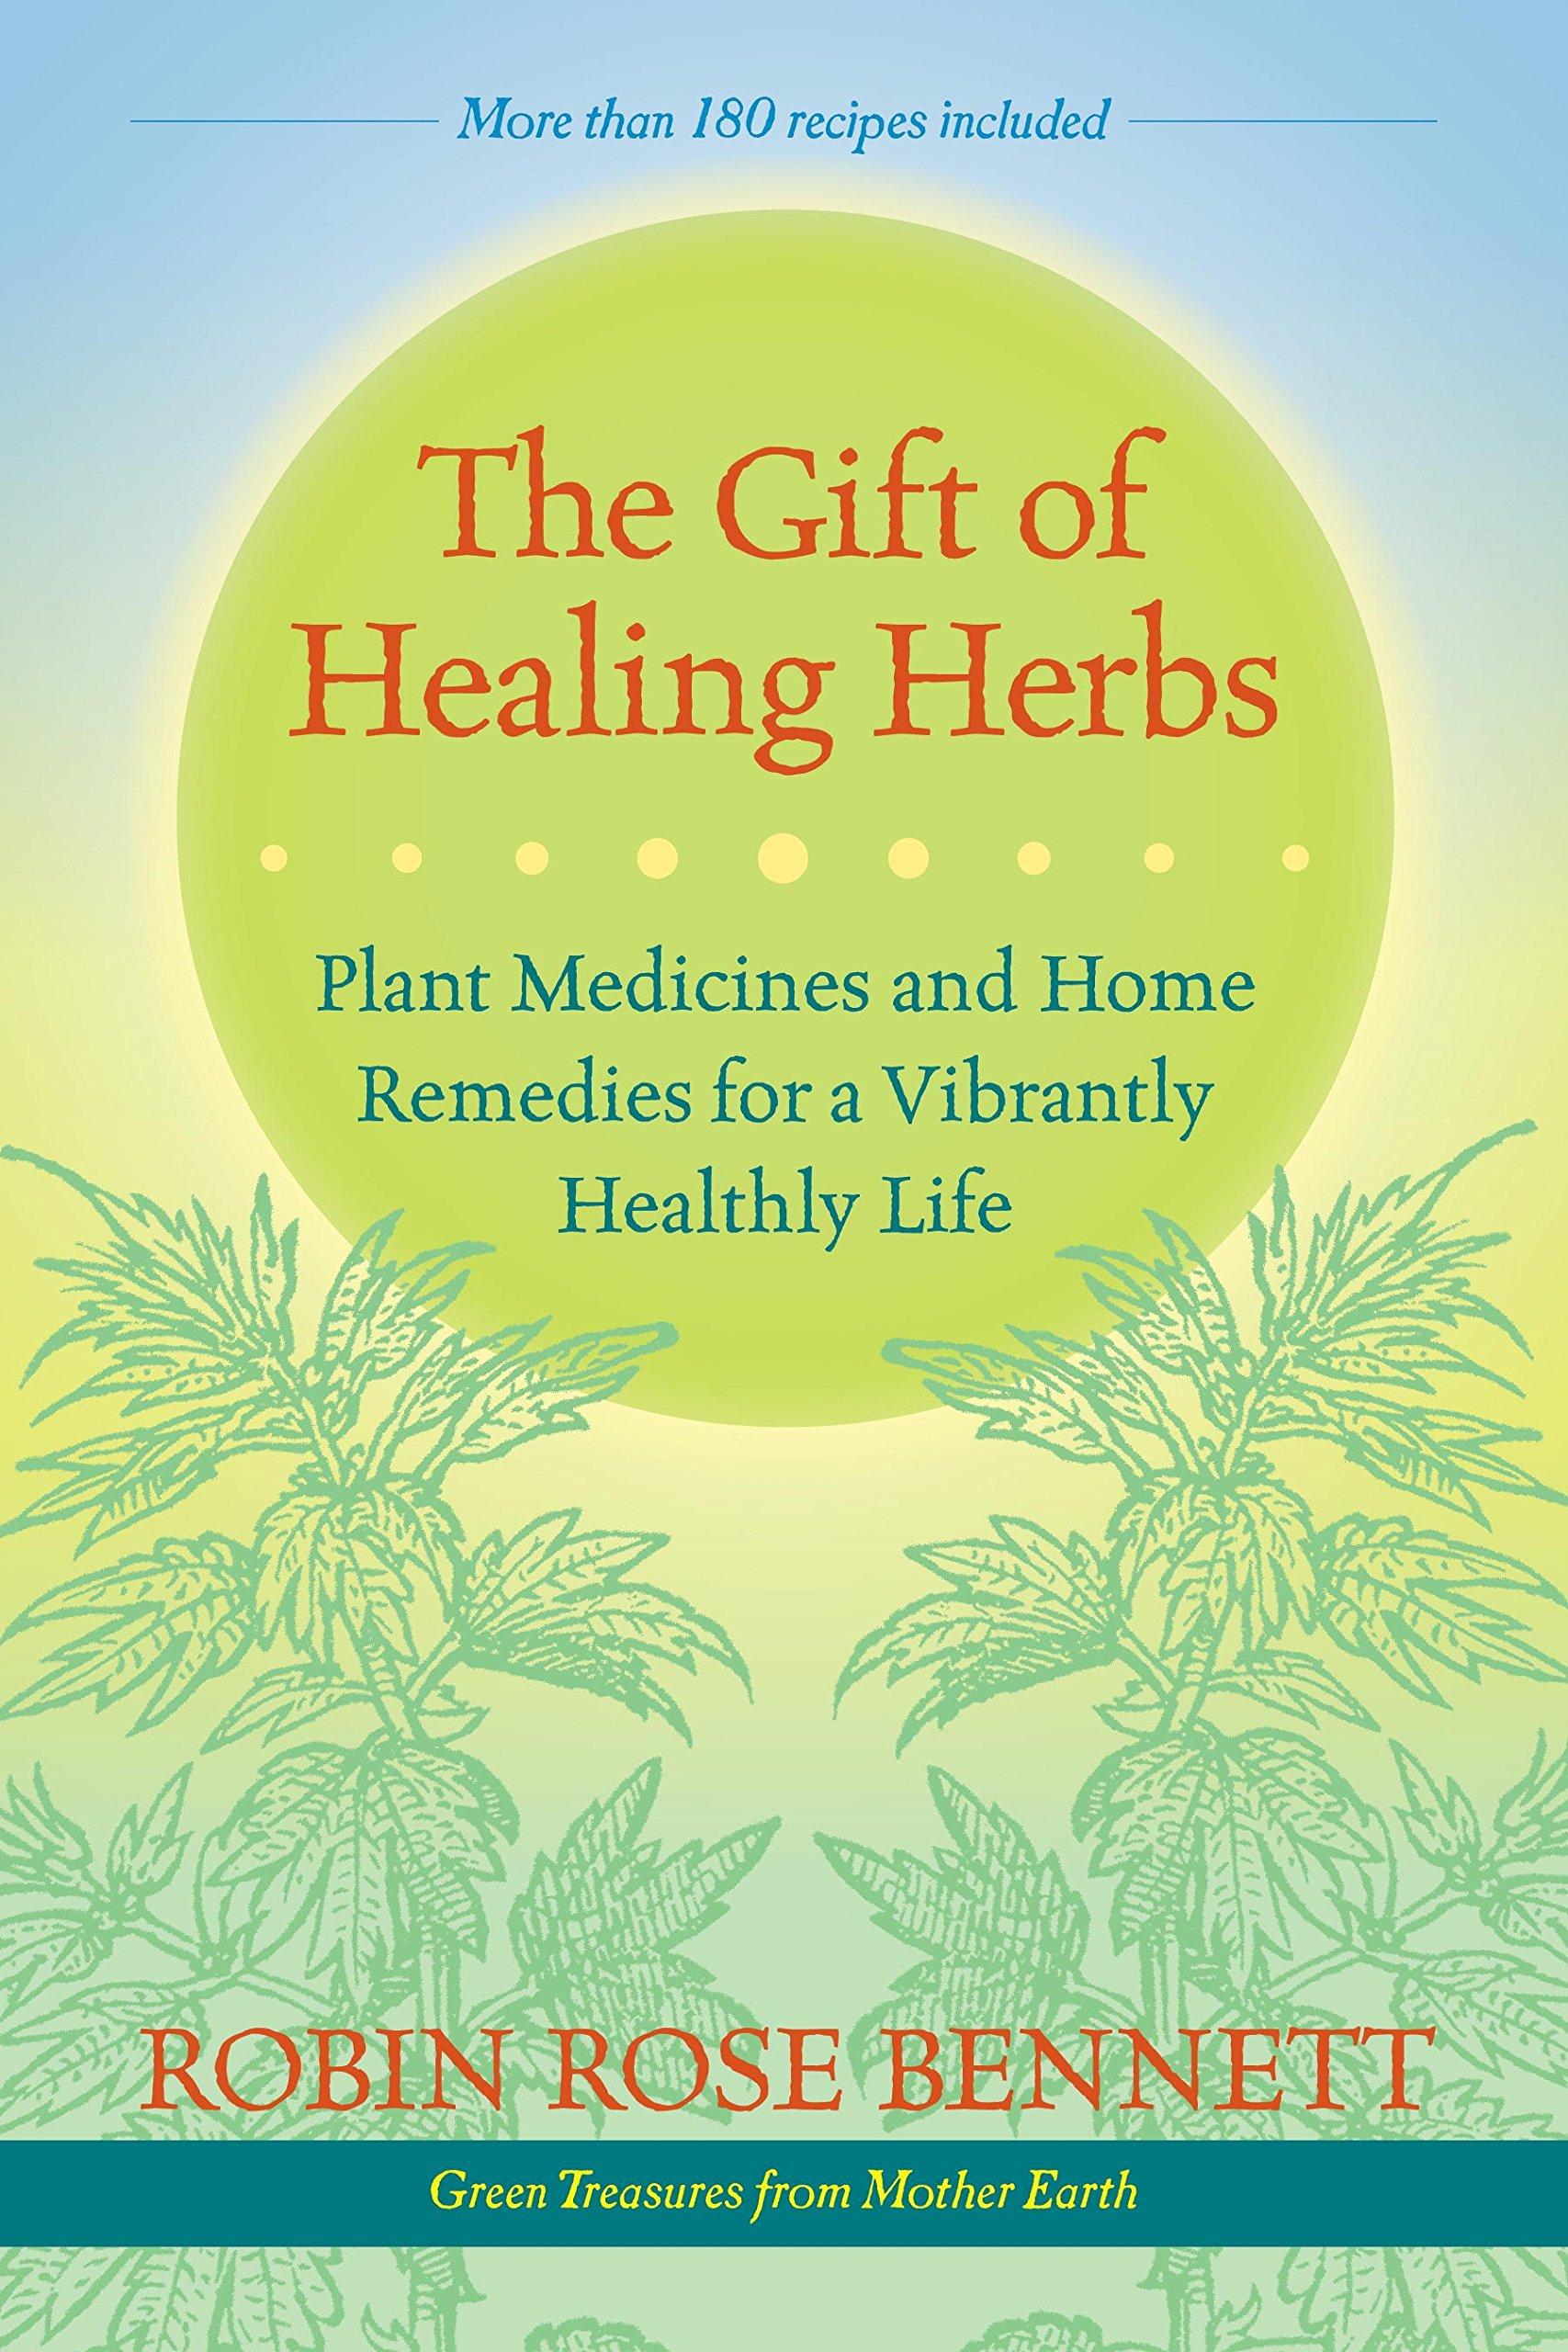 the gift of healing herbs bennett.jpg